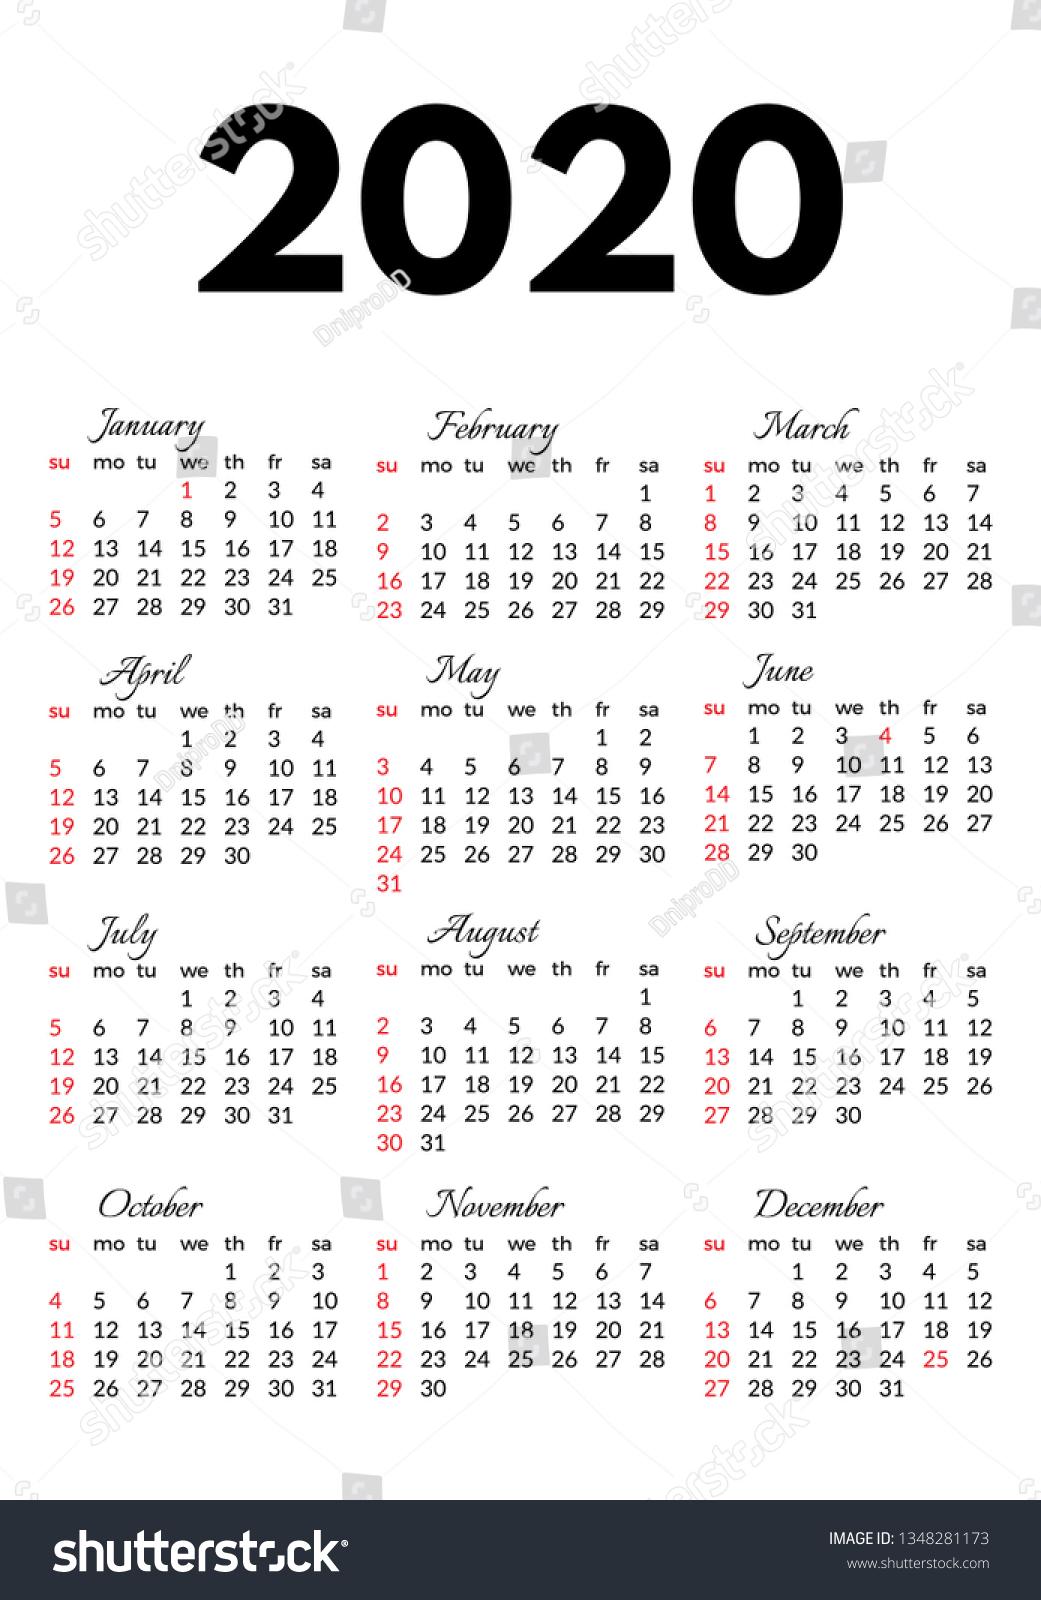 Calendar 2020 Isolated On White Background Stock Vector